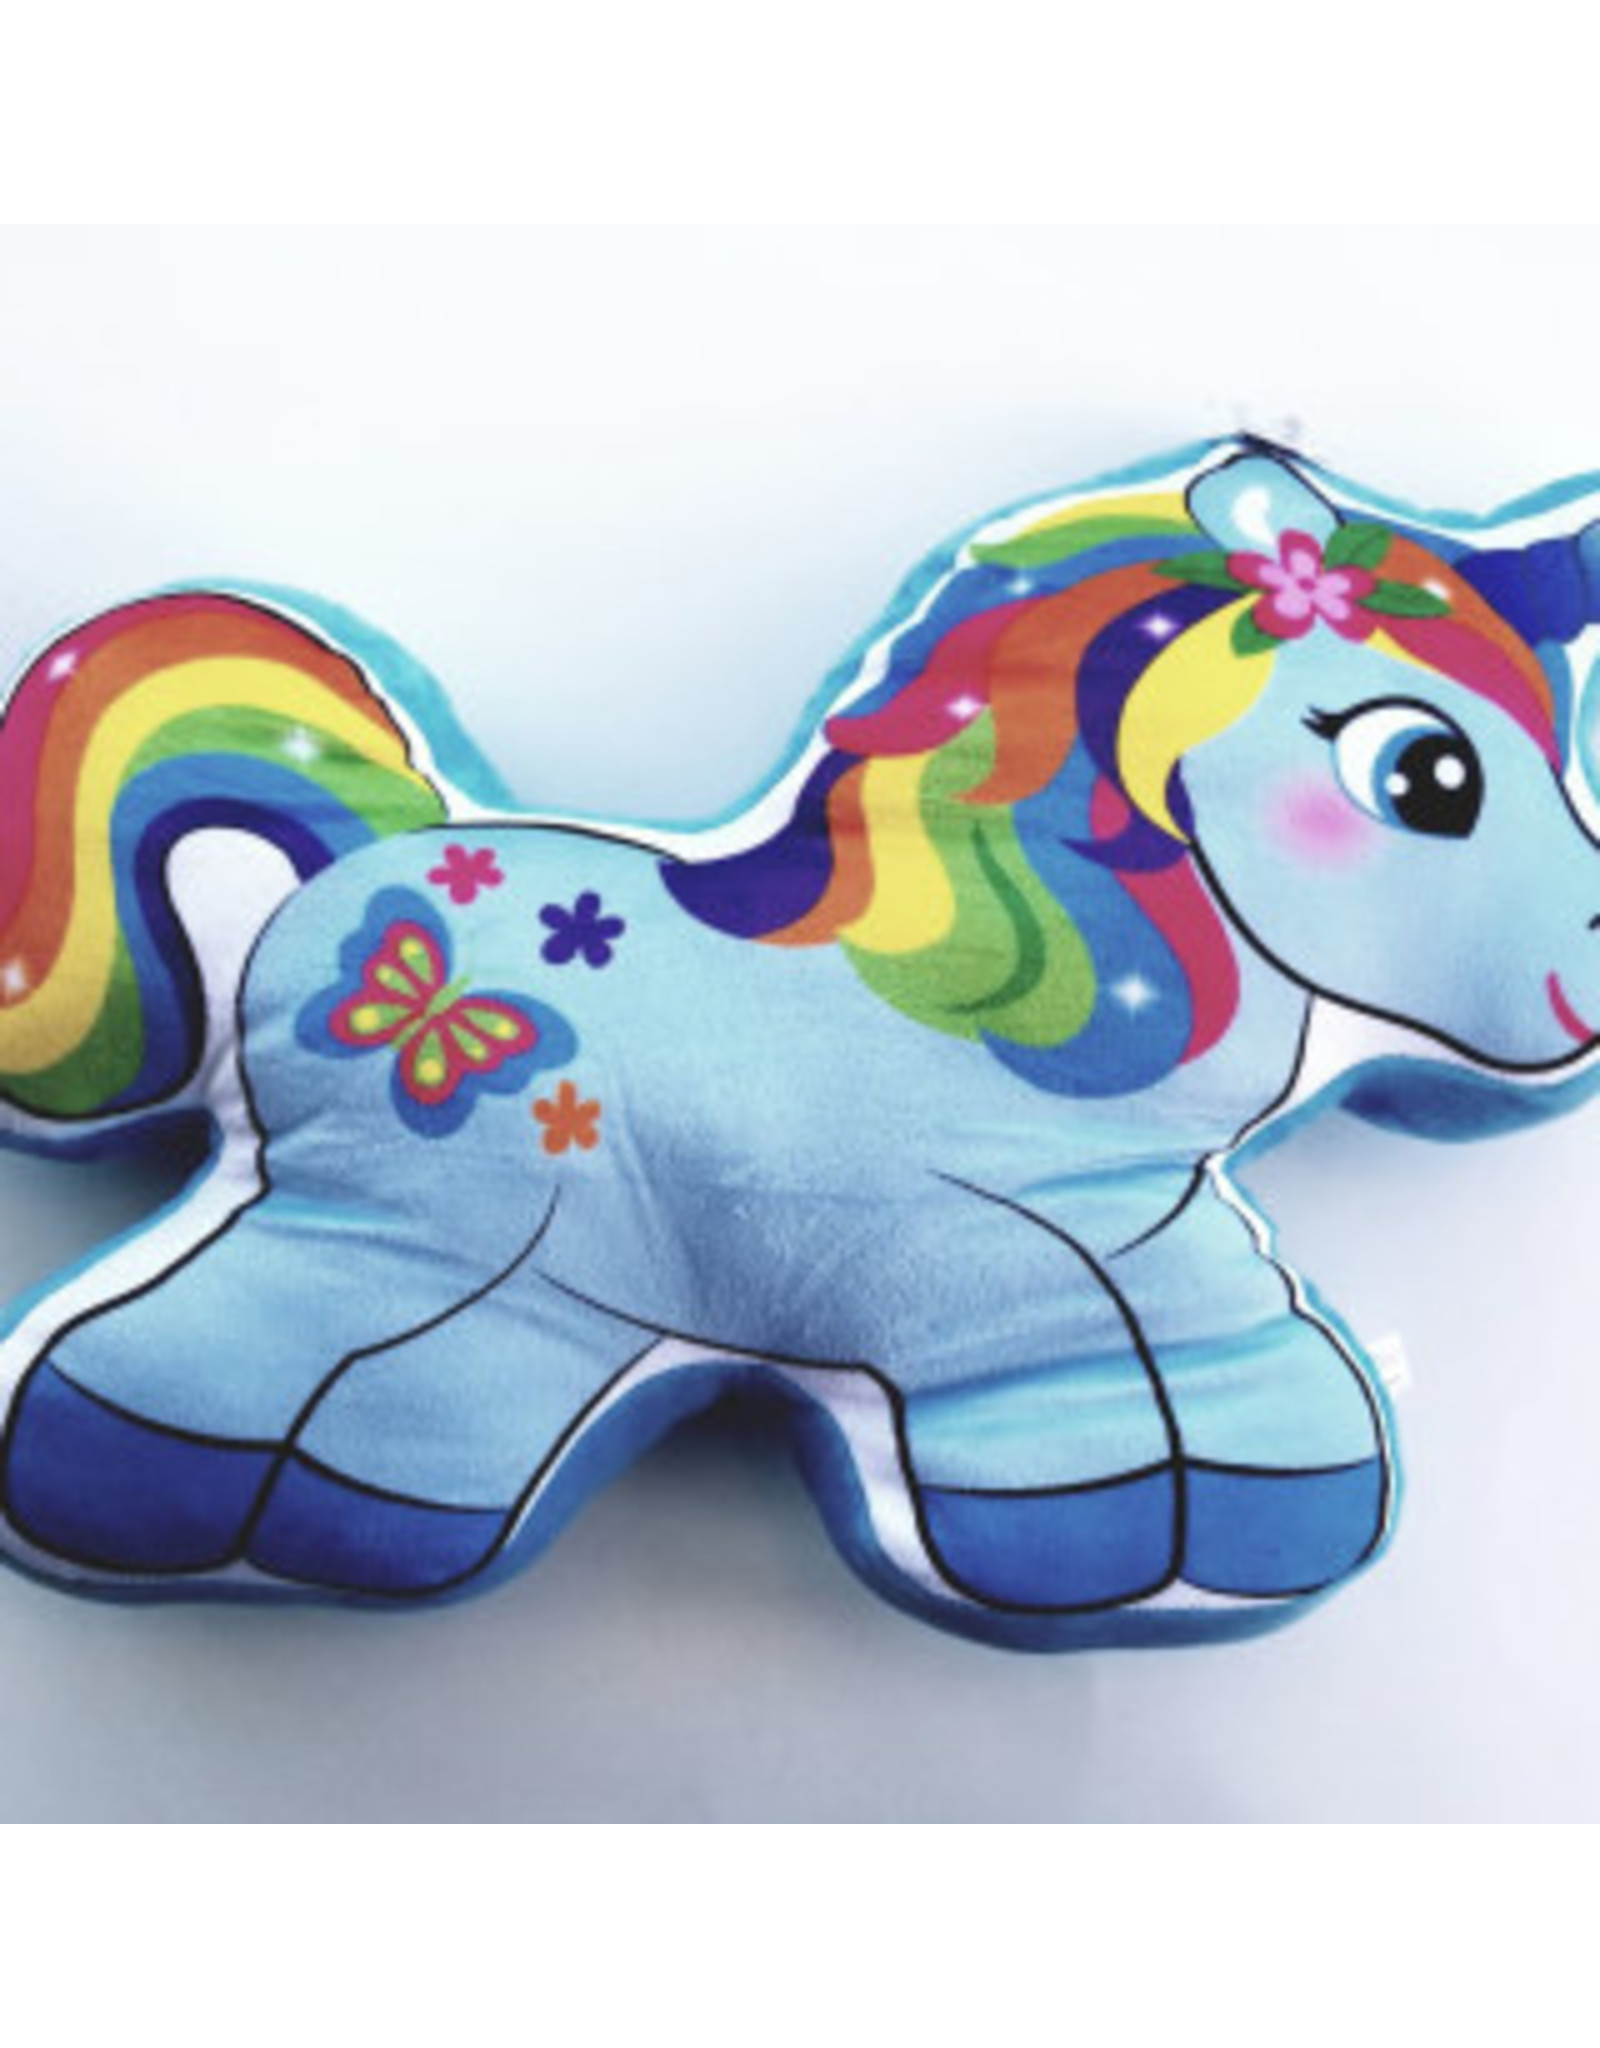 La Licornerie Unicorn Shaped Cushion